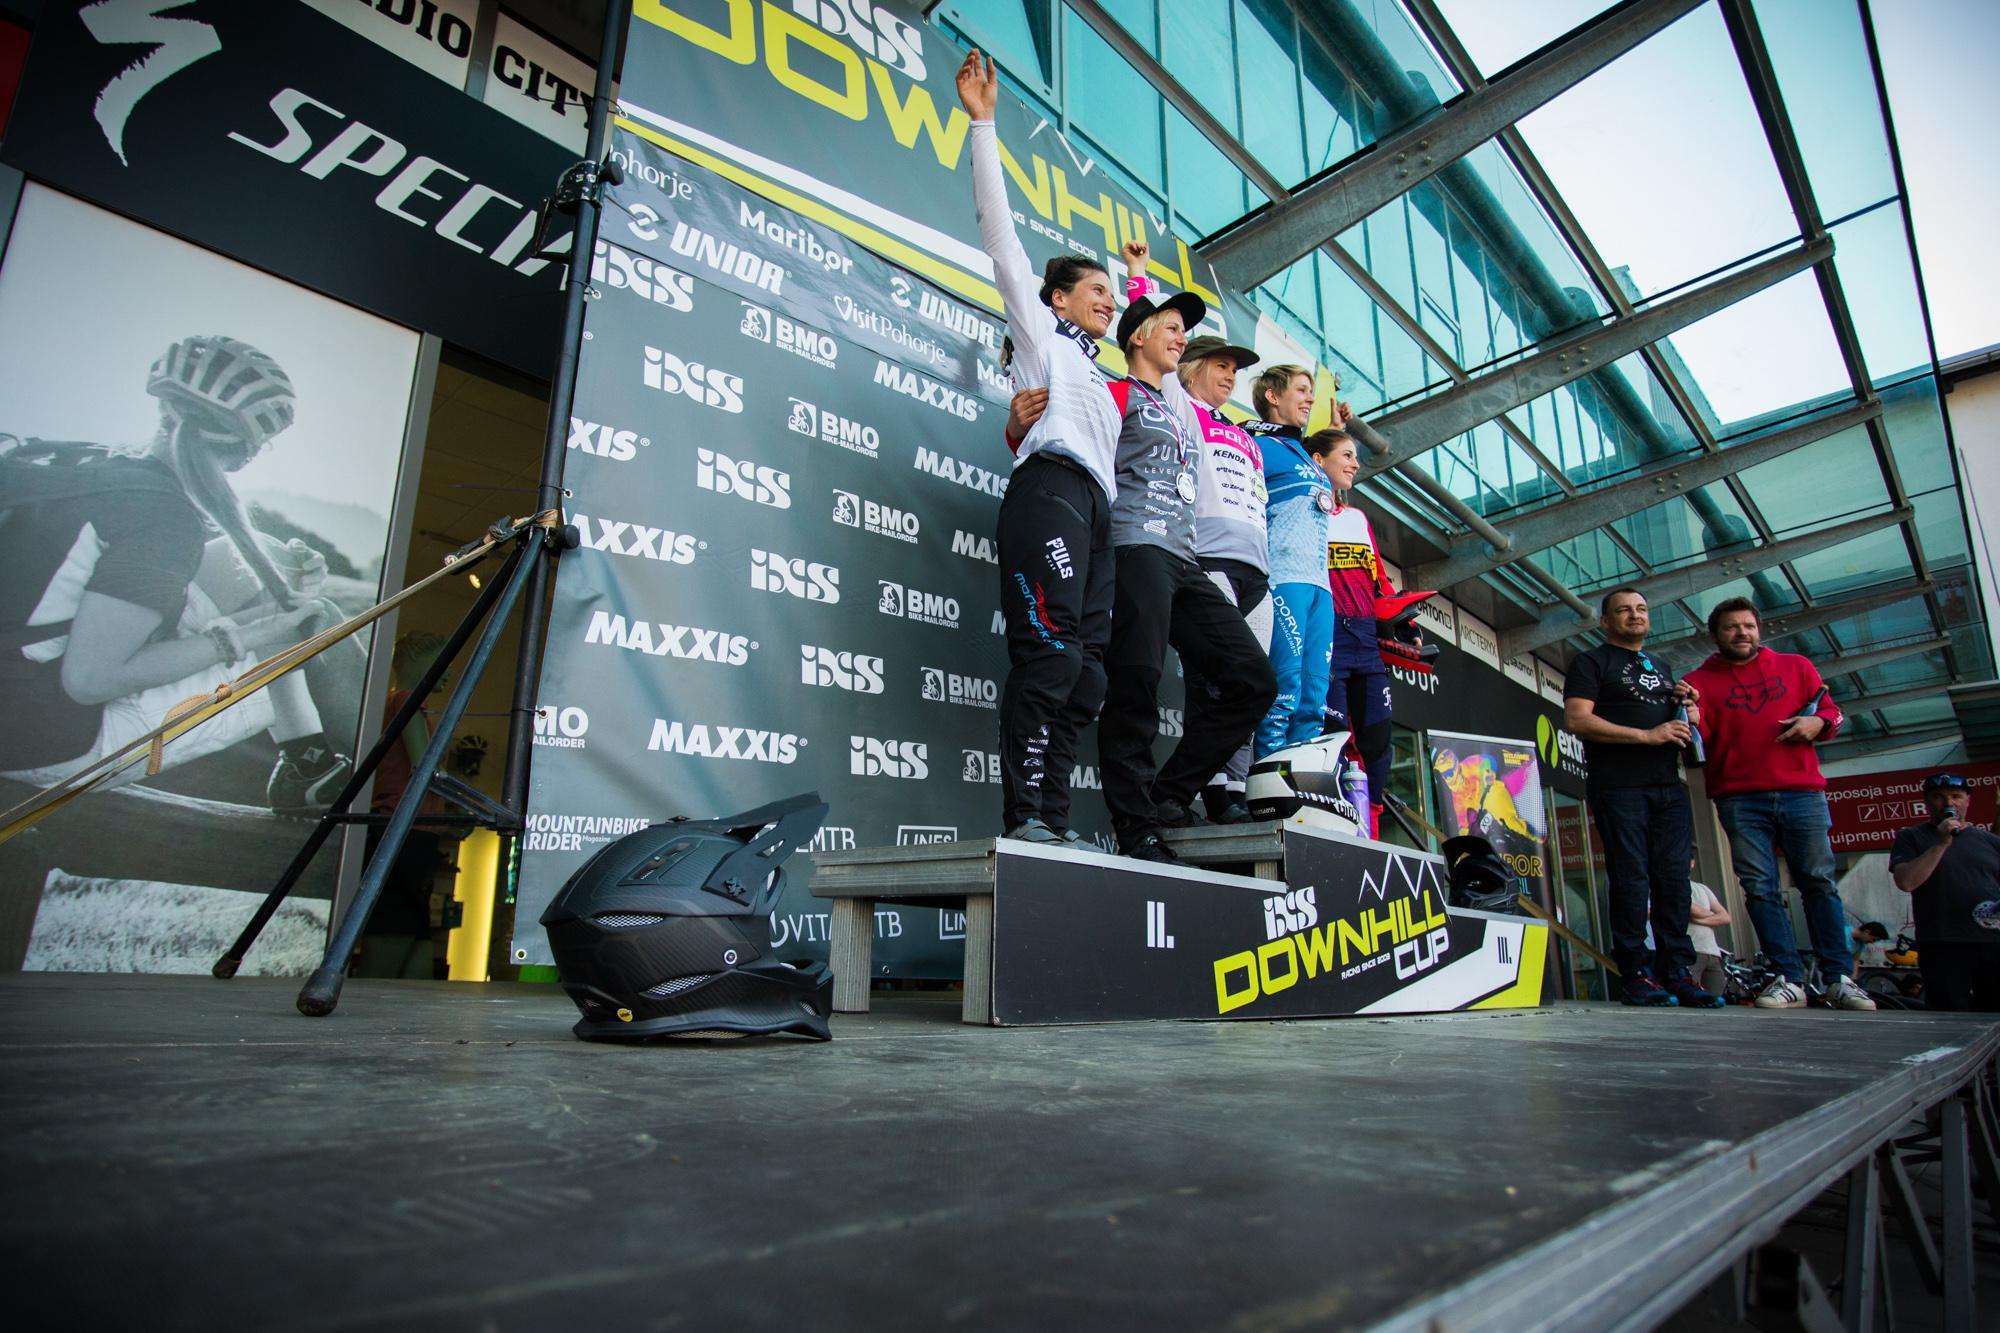 Elite Women's Podium - iXS Downhill Cup Maribor - Race